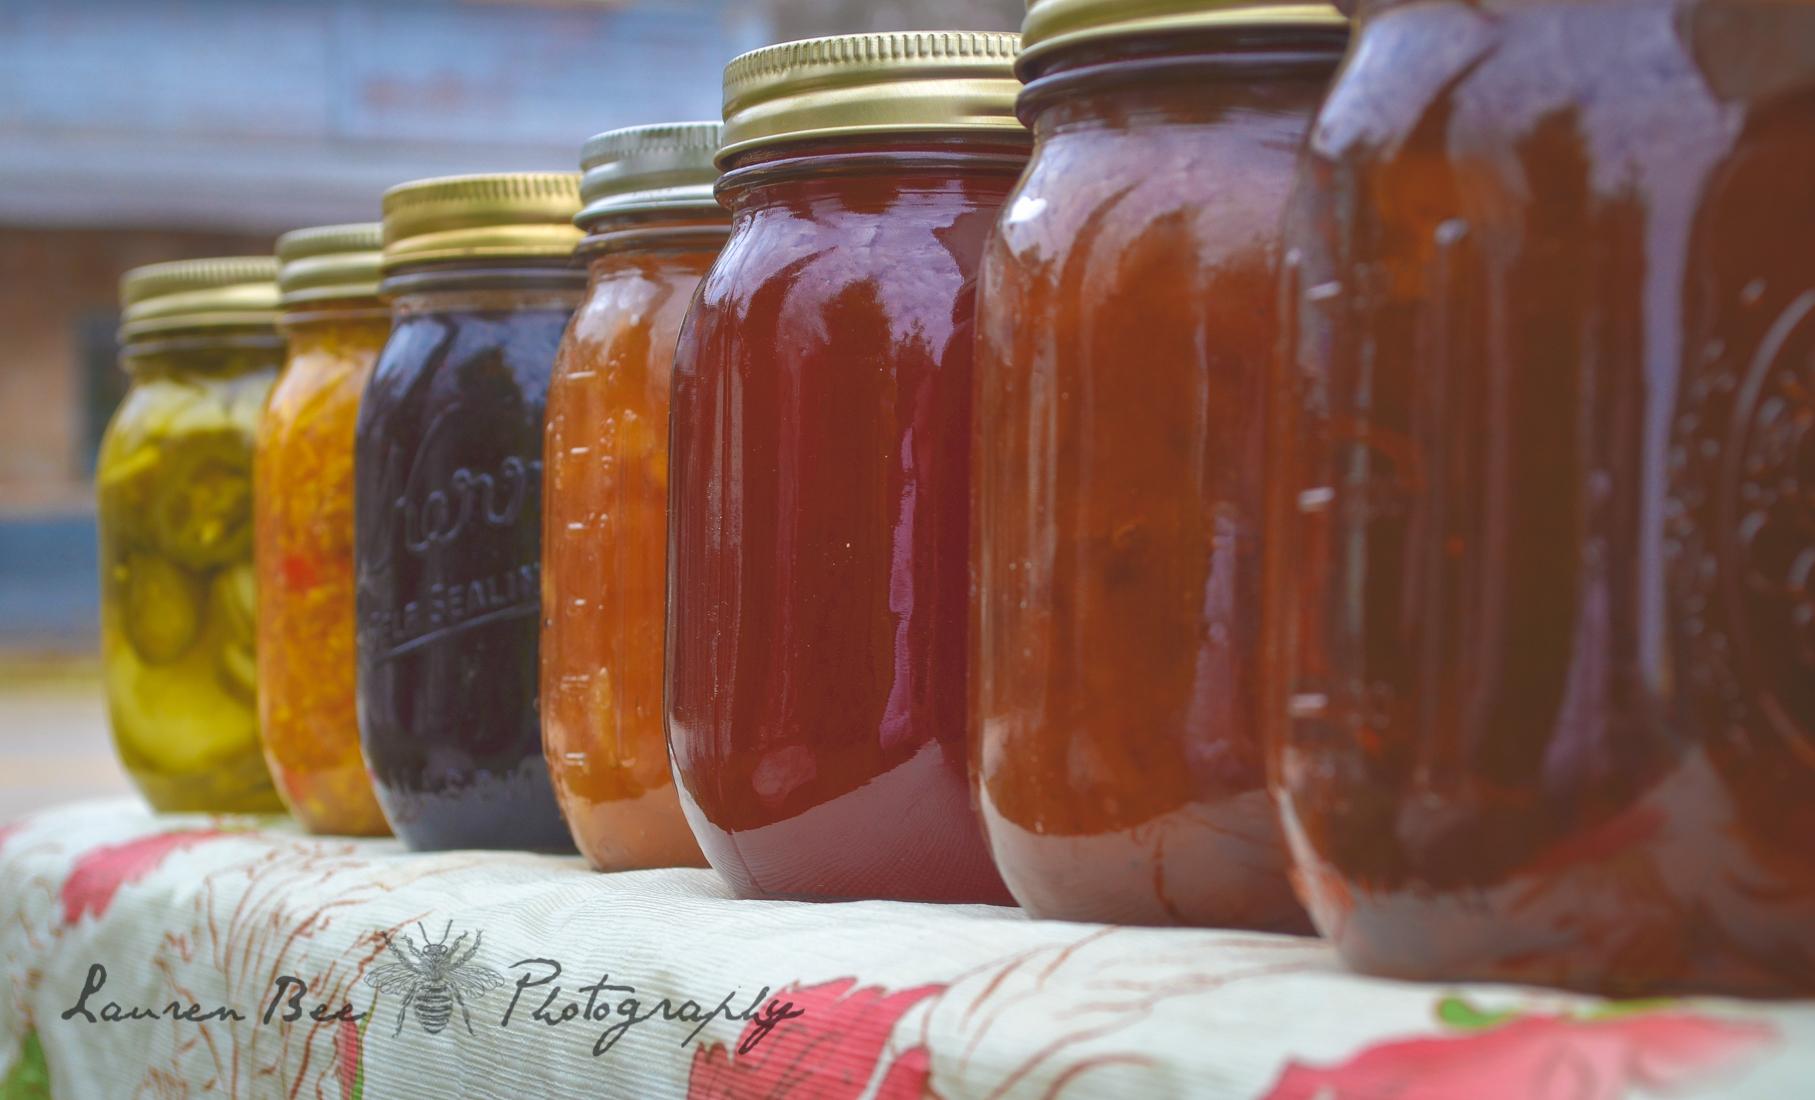 jars in sunlight